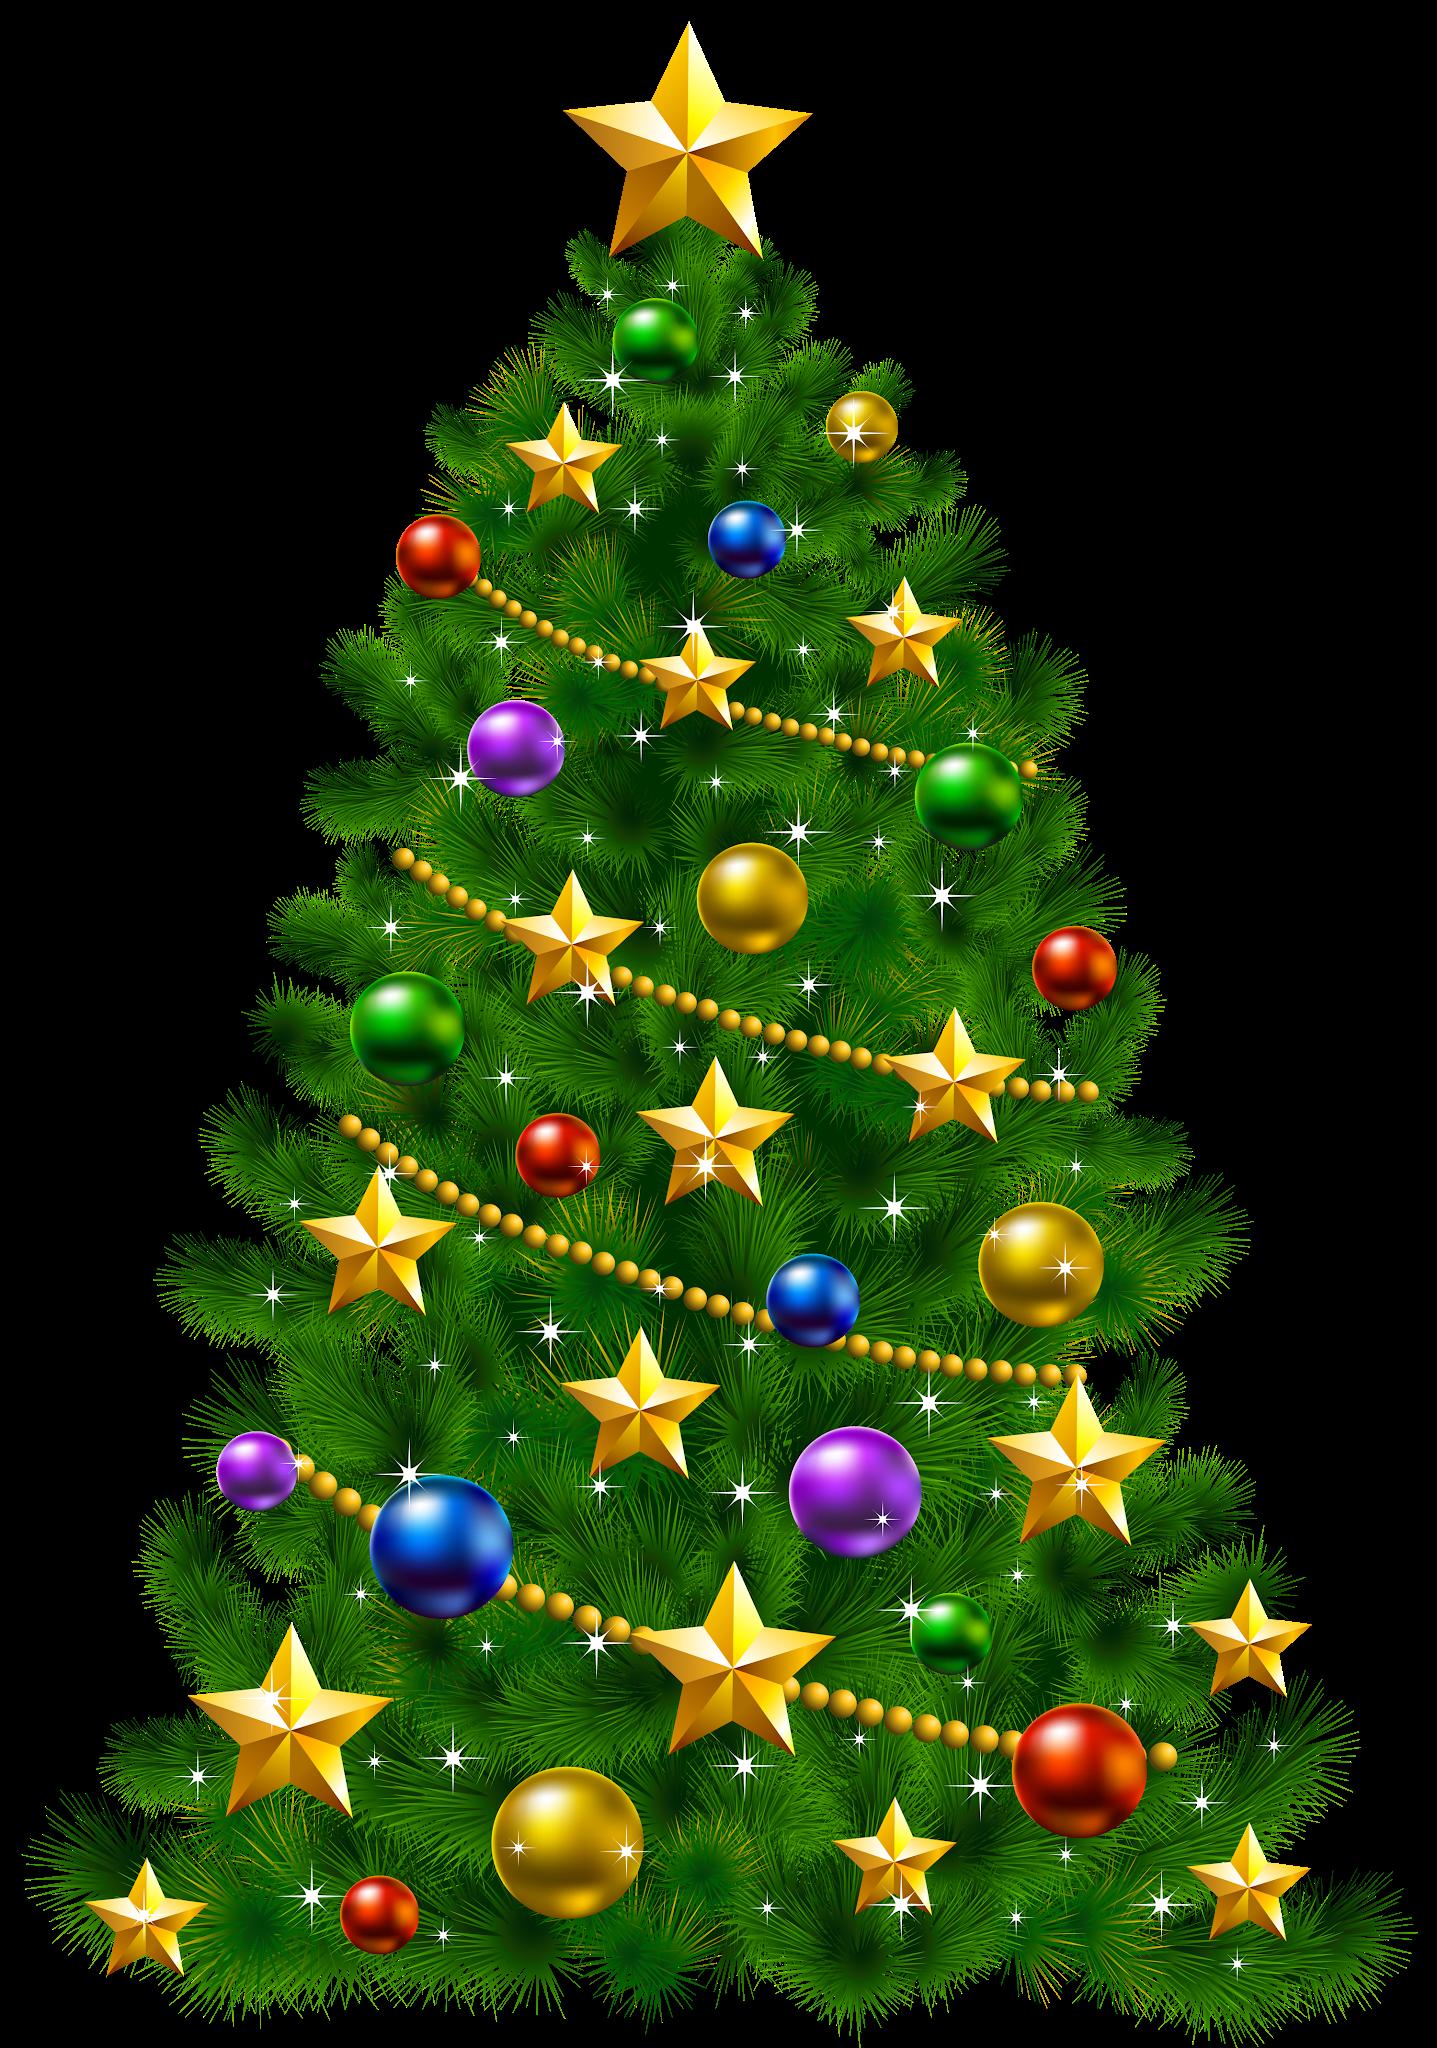 Christmas Tree Png Transparent Christmas Png Image Clipart Christmas Tree Coloring Page Christmas Tree Art Birthday Tree